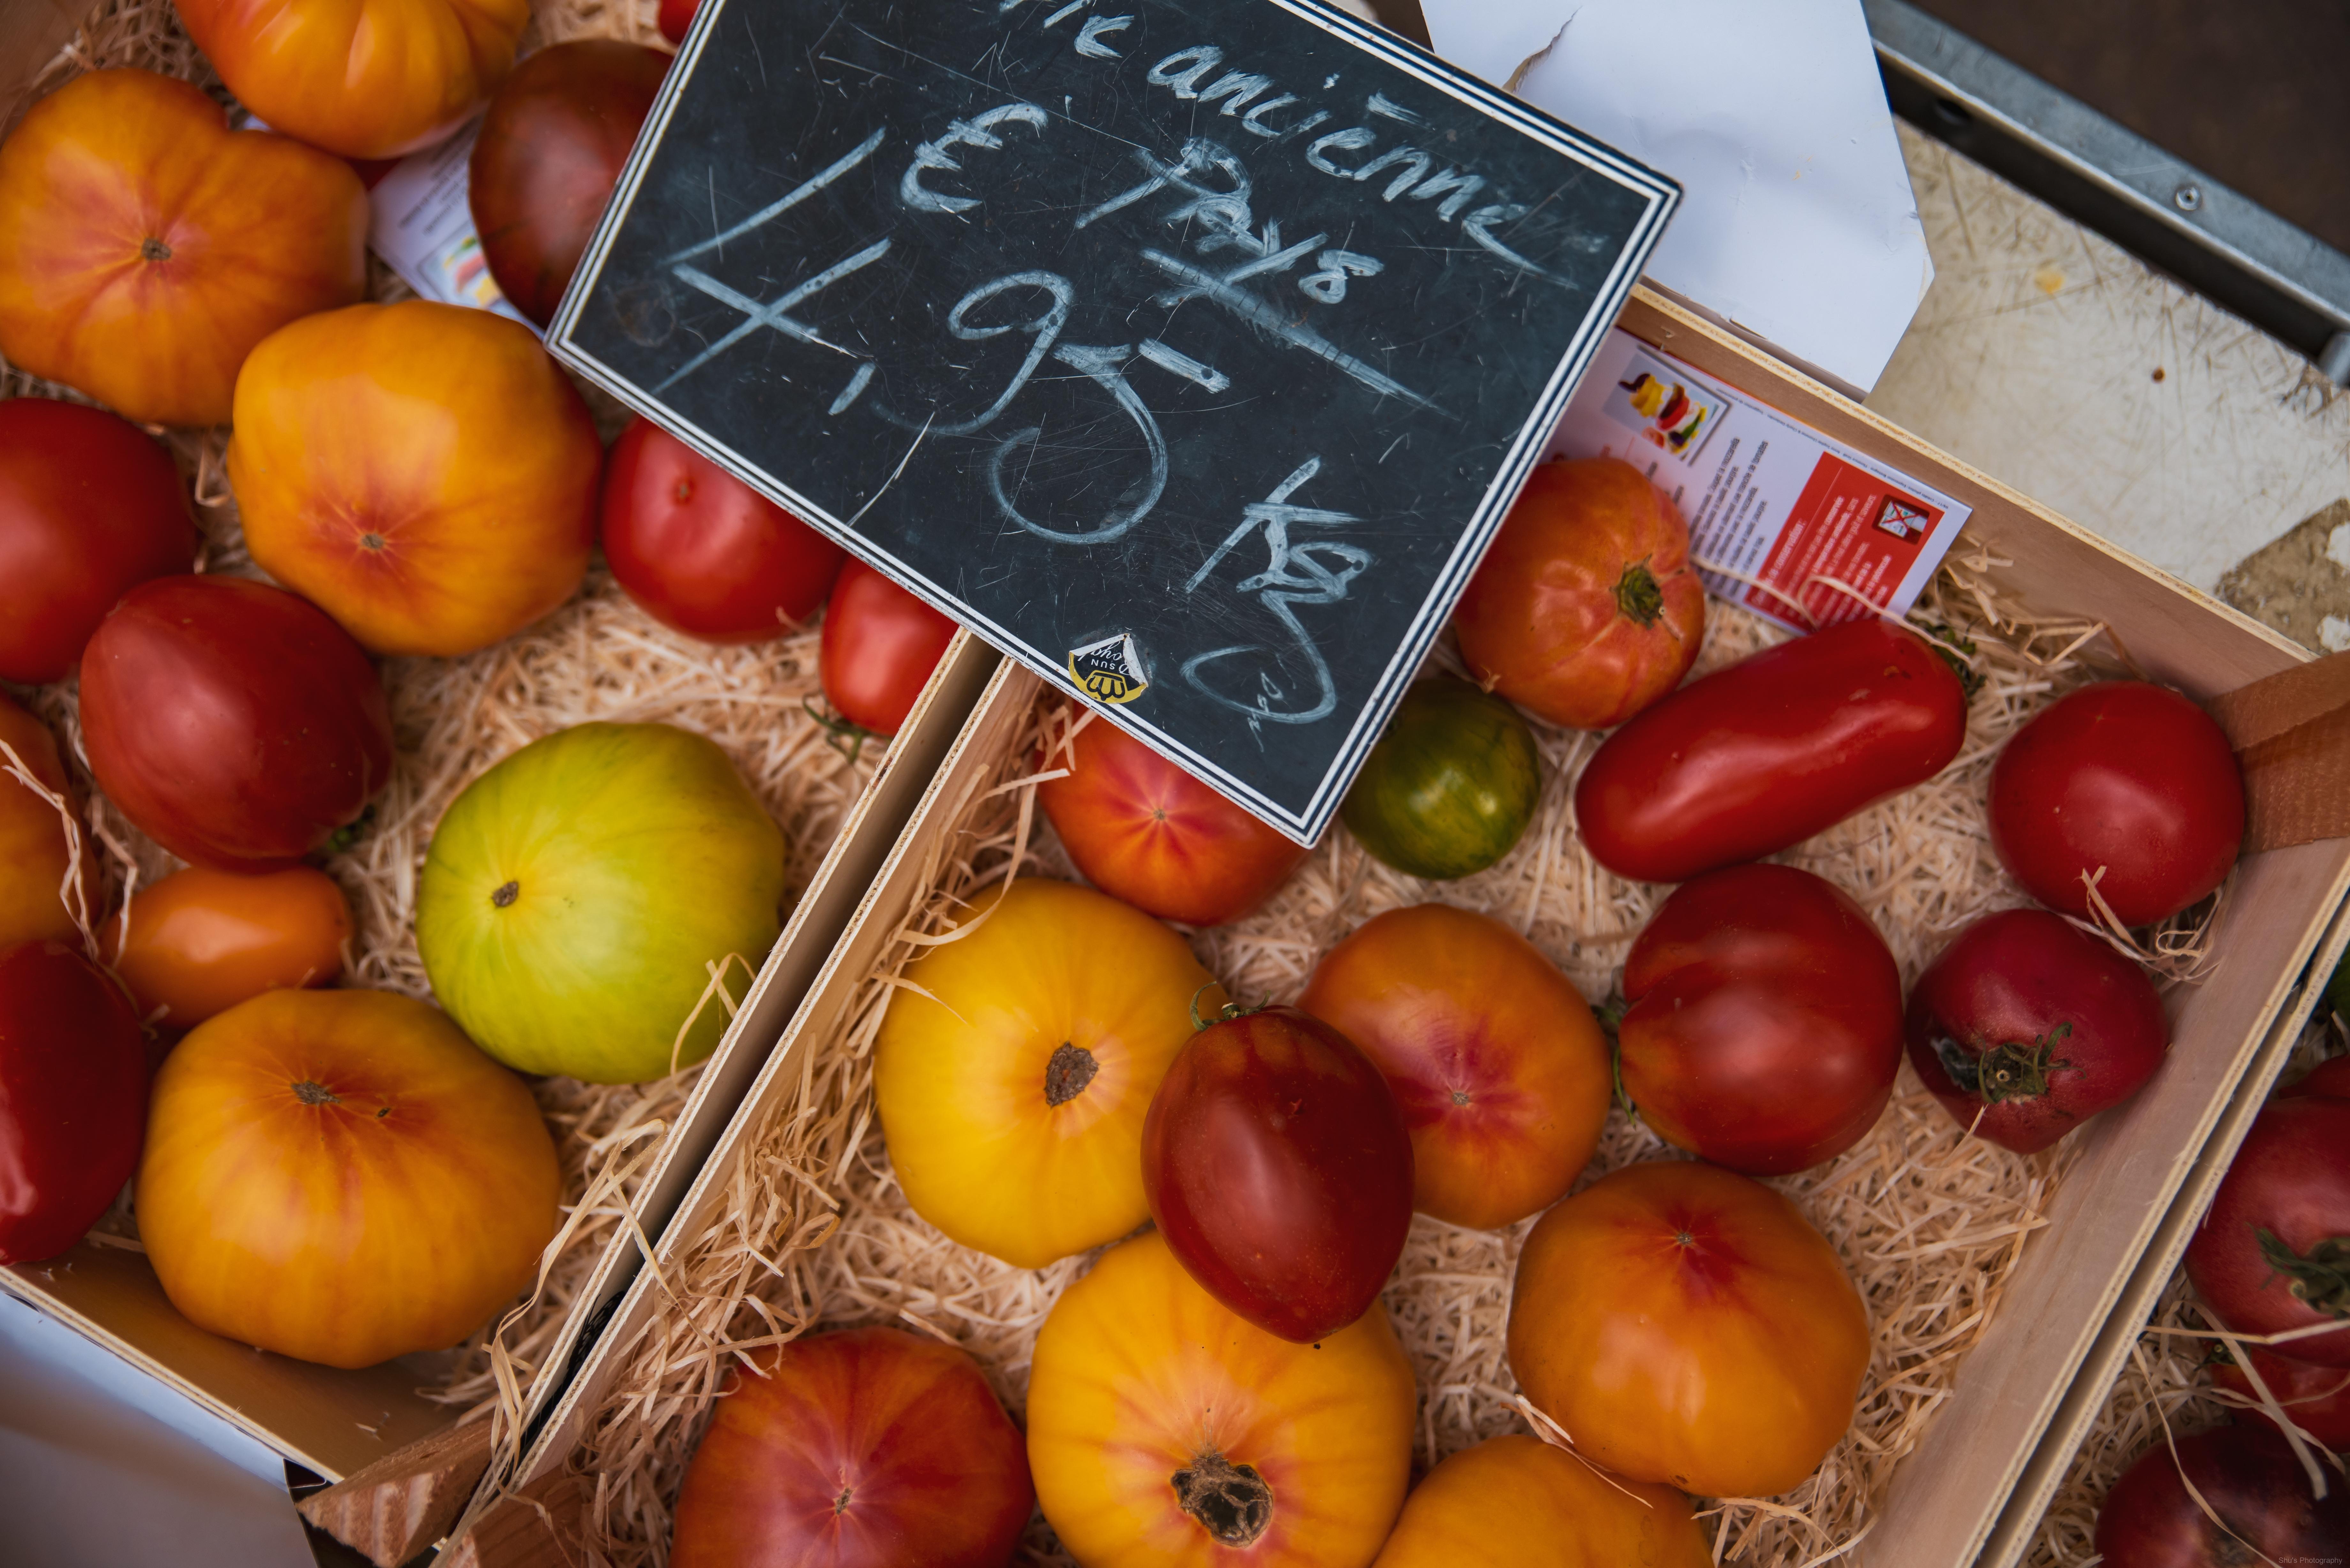 Vege market - Napoli, Italy